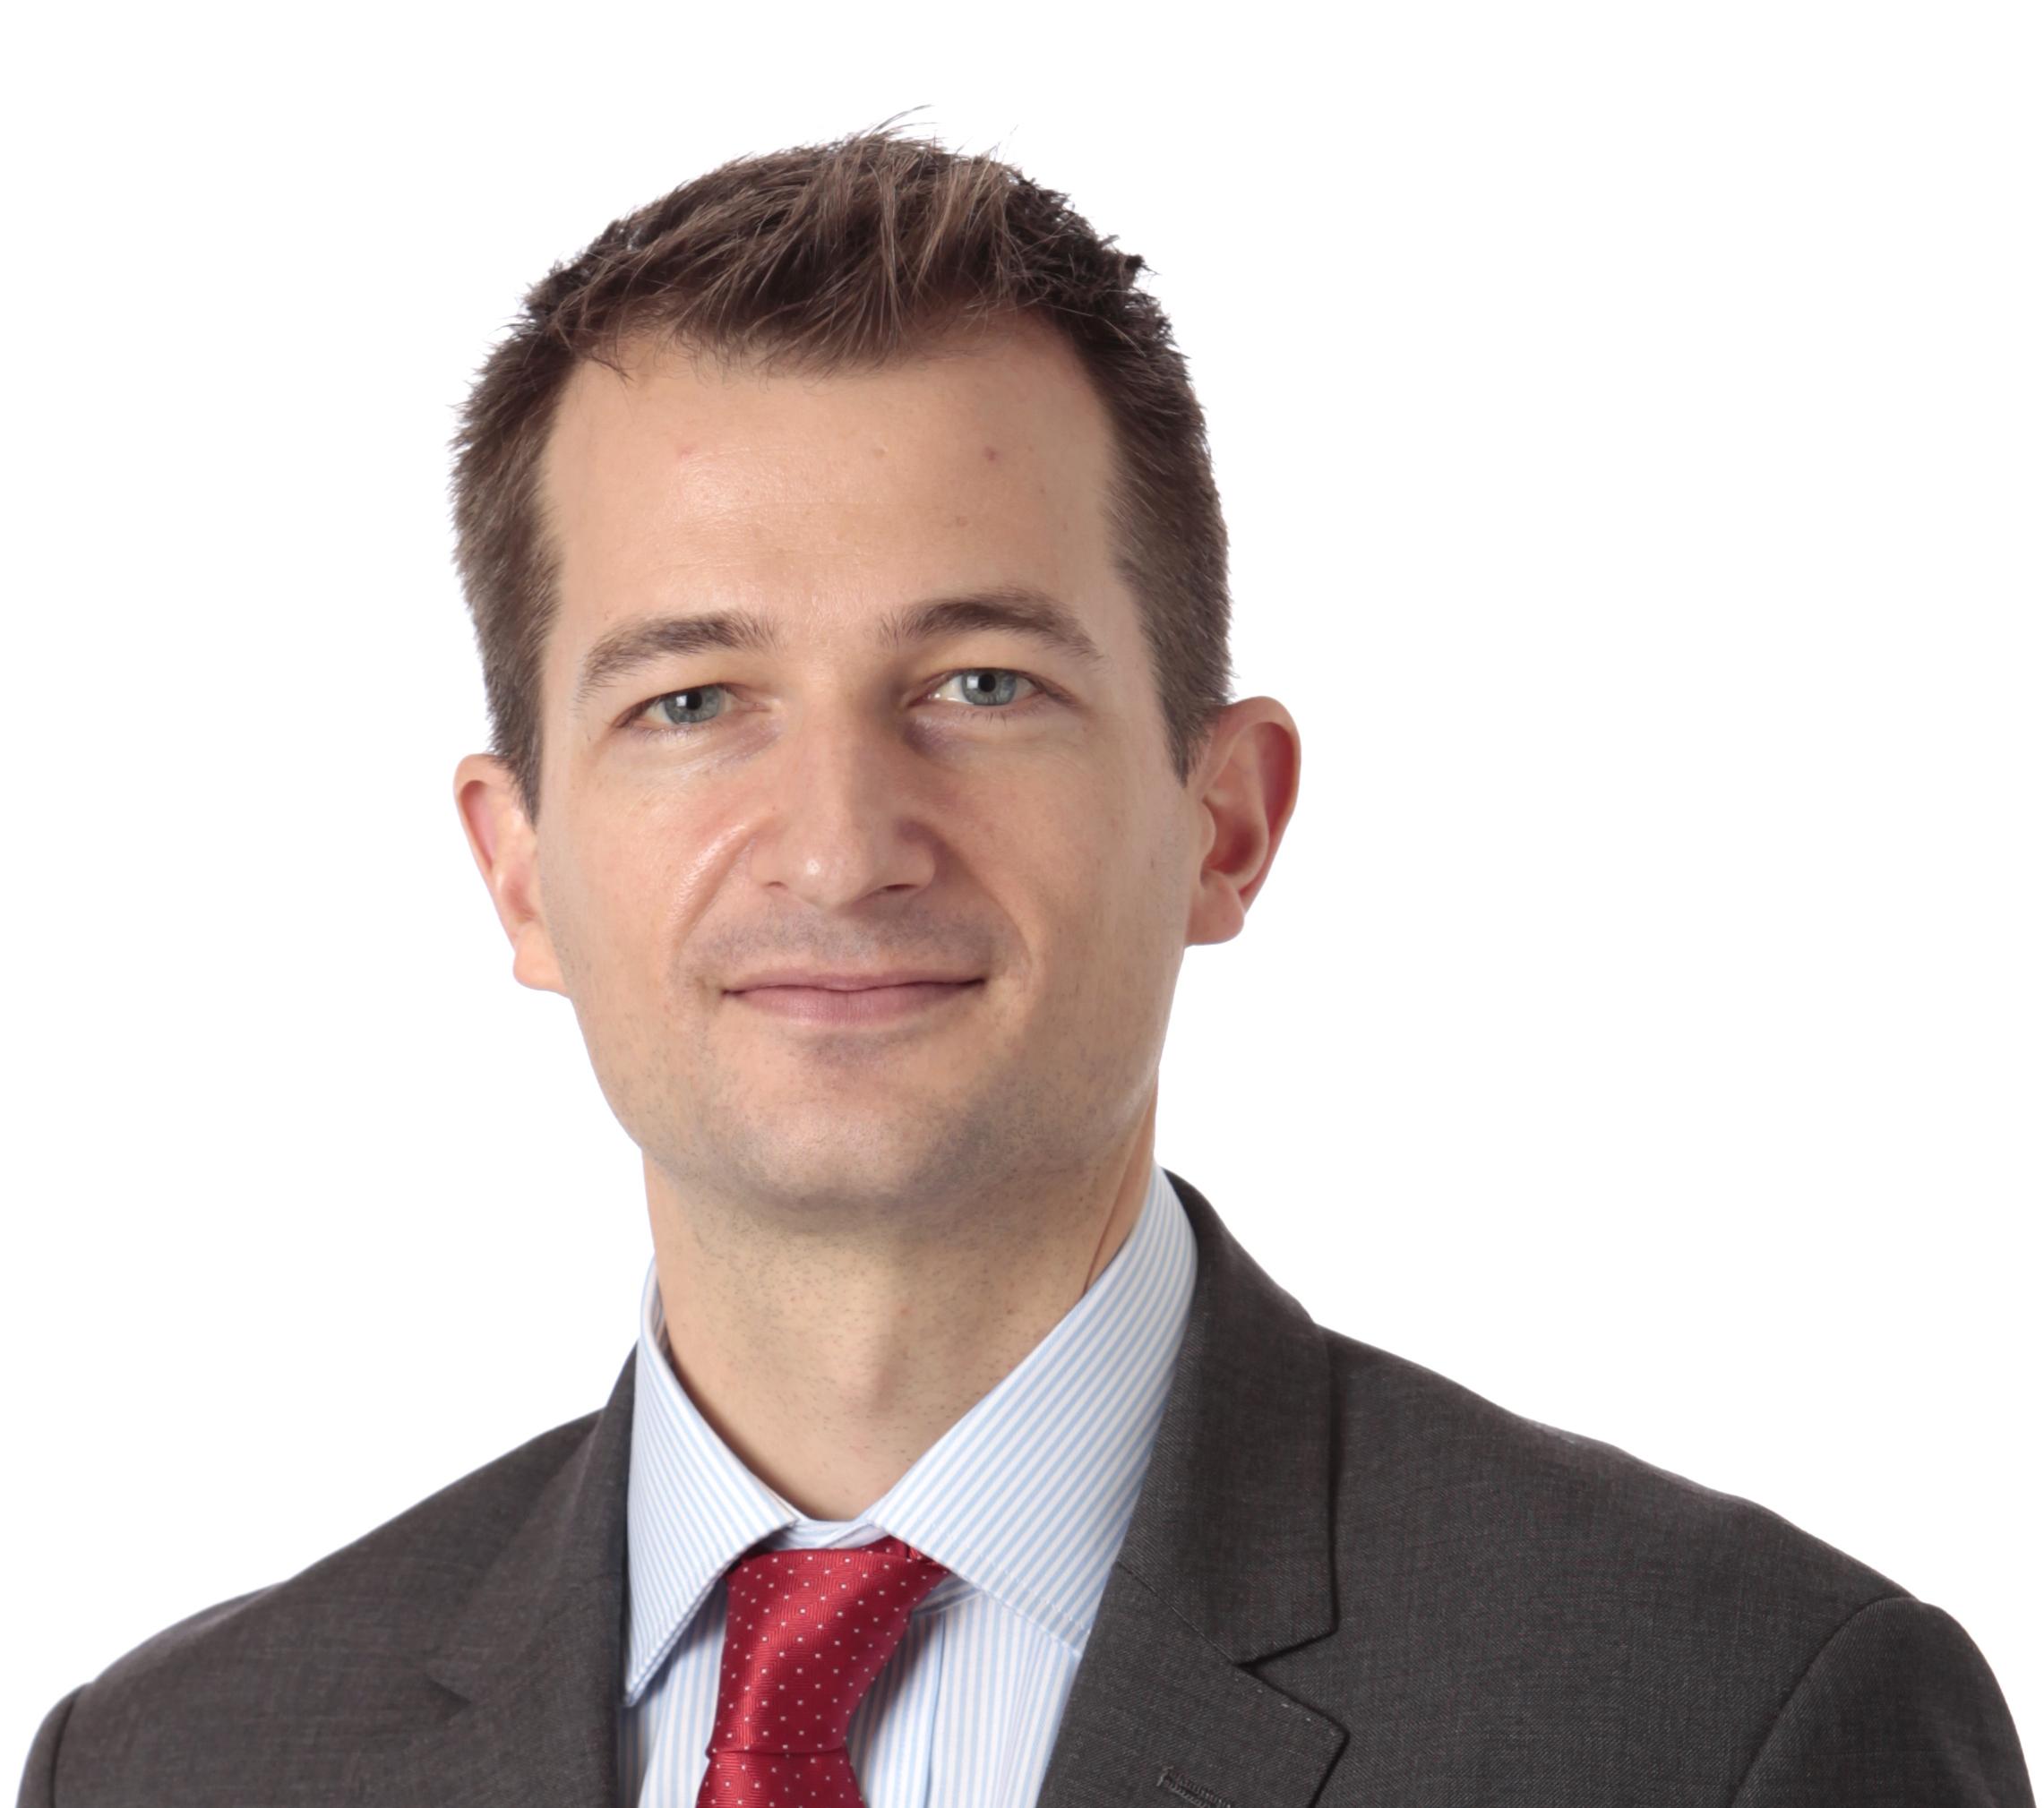 David Ward, a tax director from Johnston Carmichael